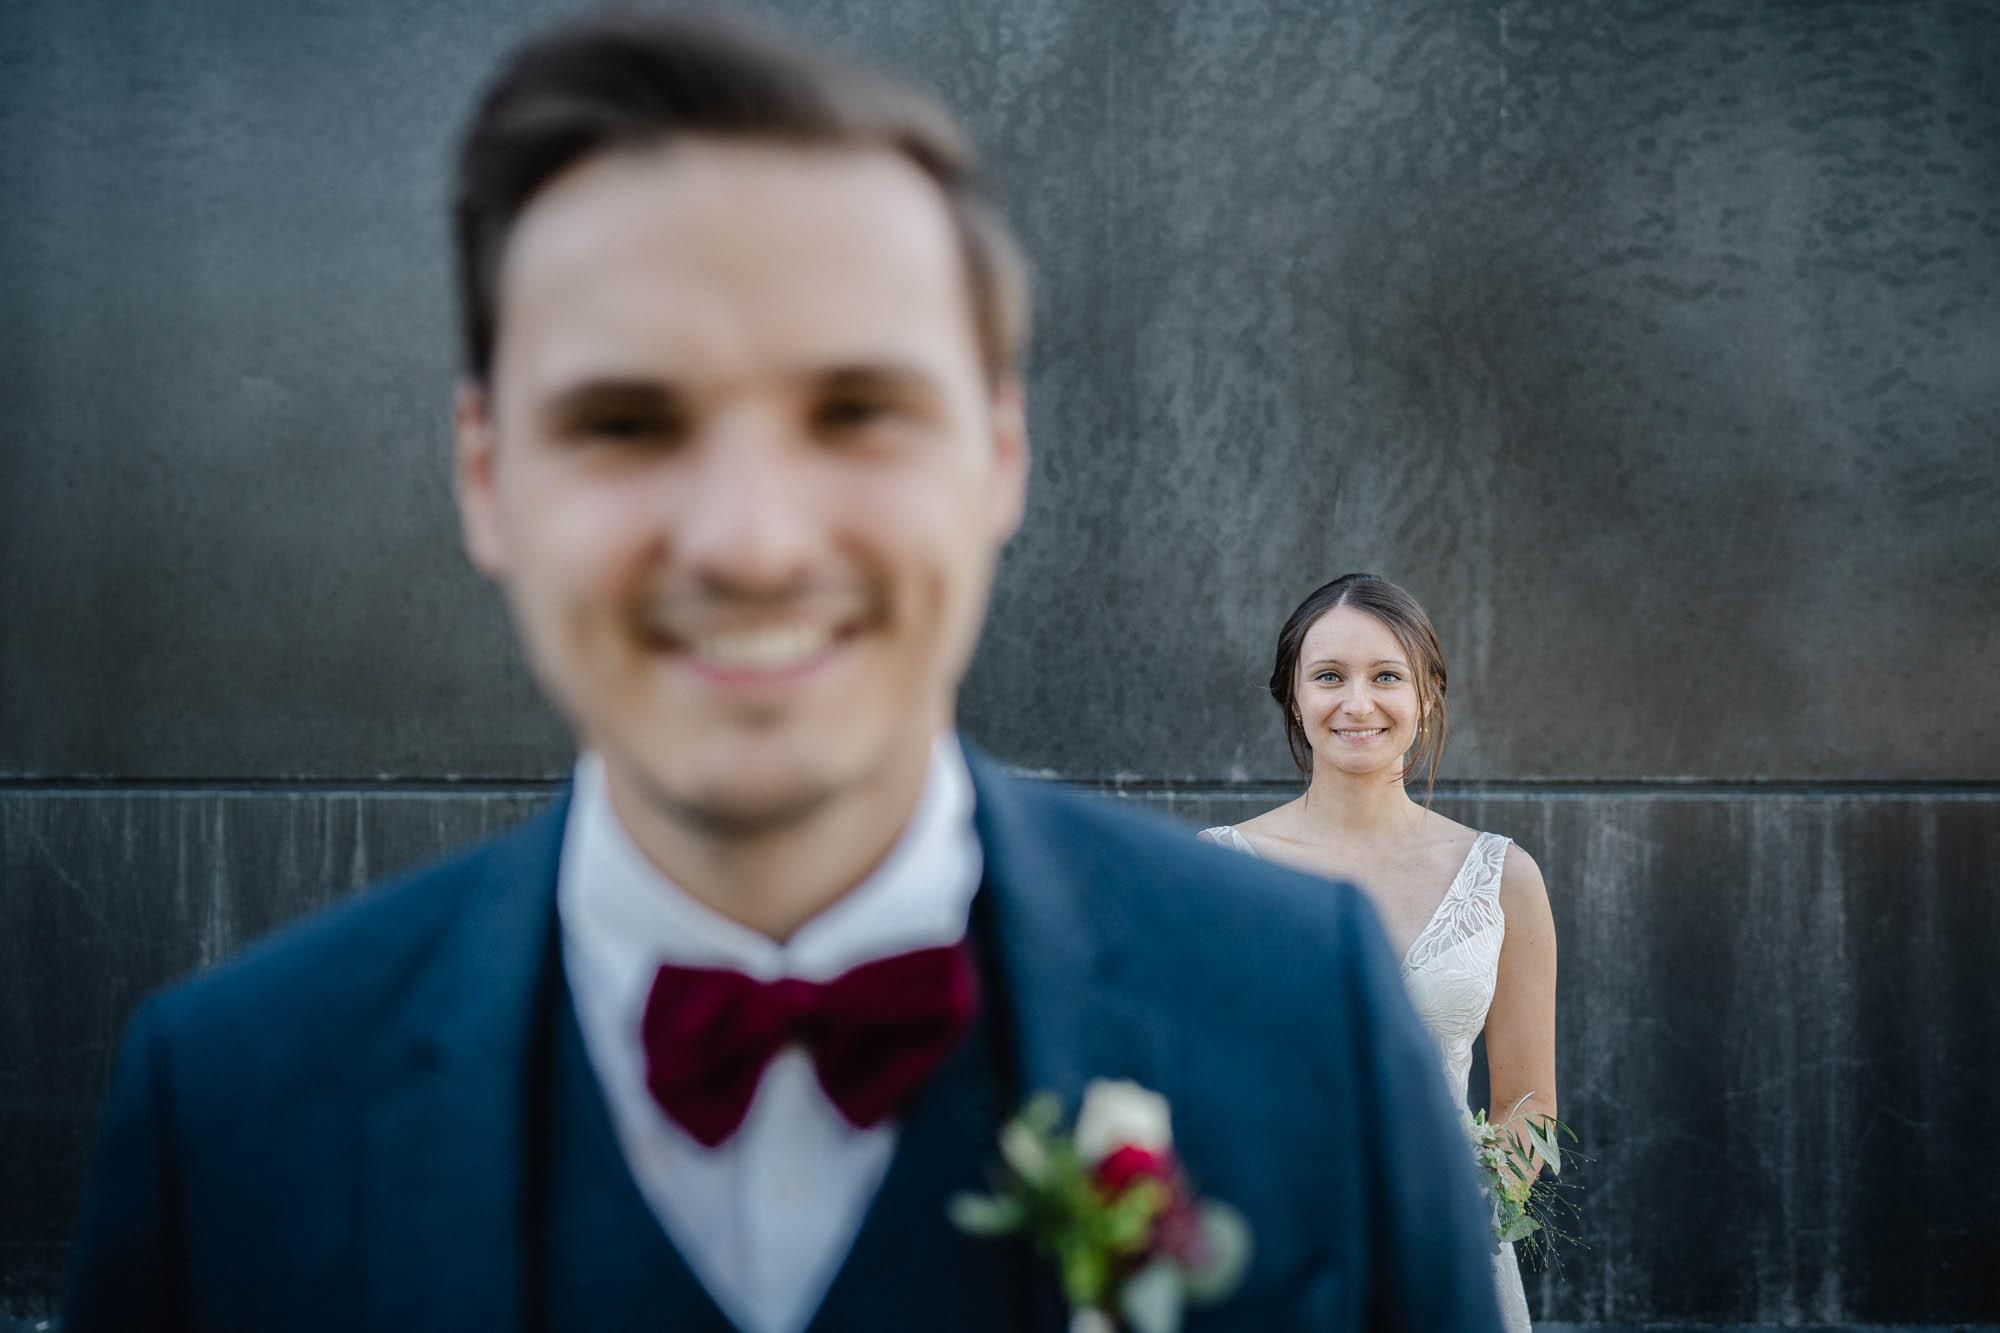 Hochzeit in Deggendorf, Paarshooting, Paar schaut in die Kamera